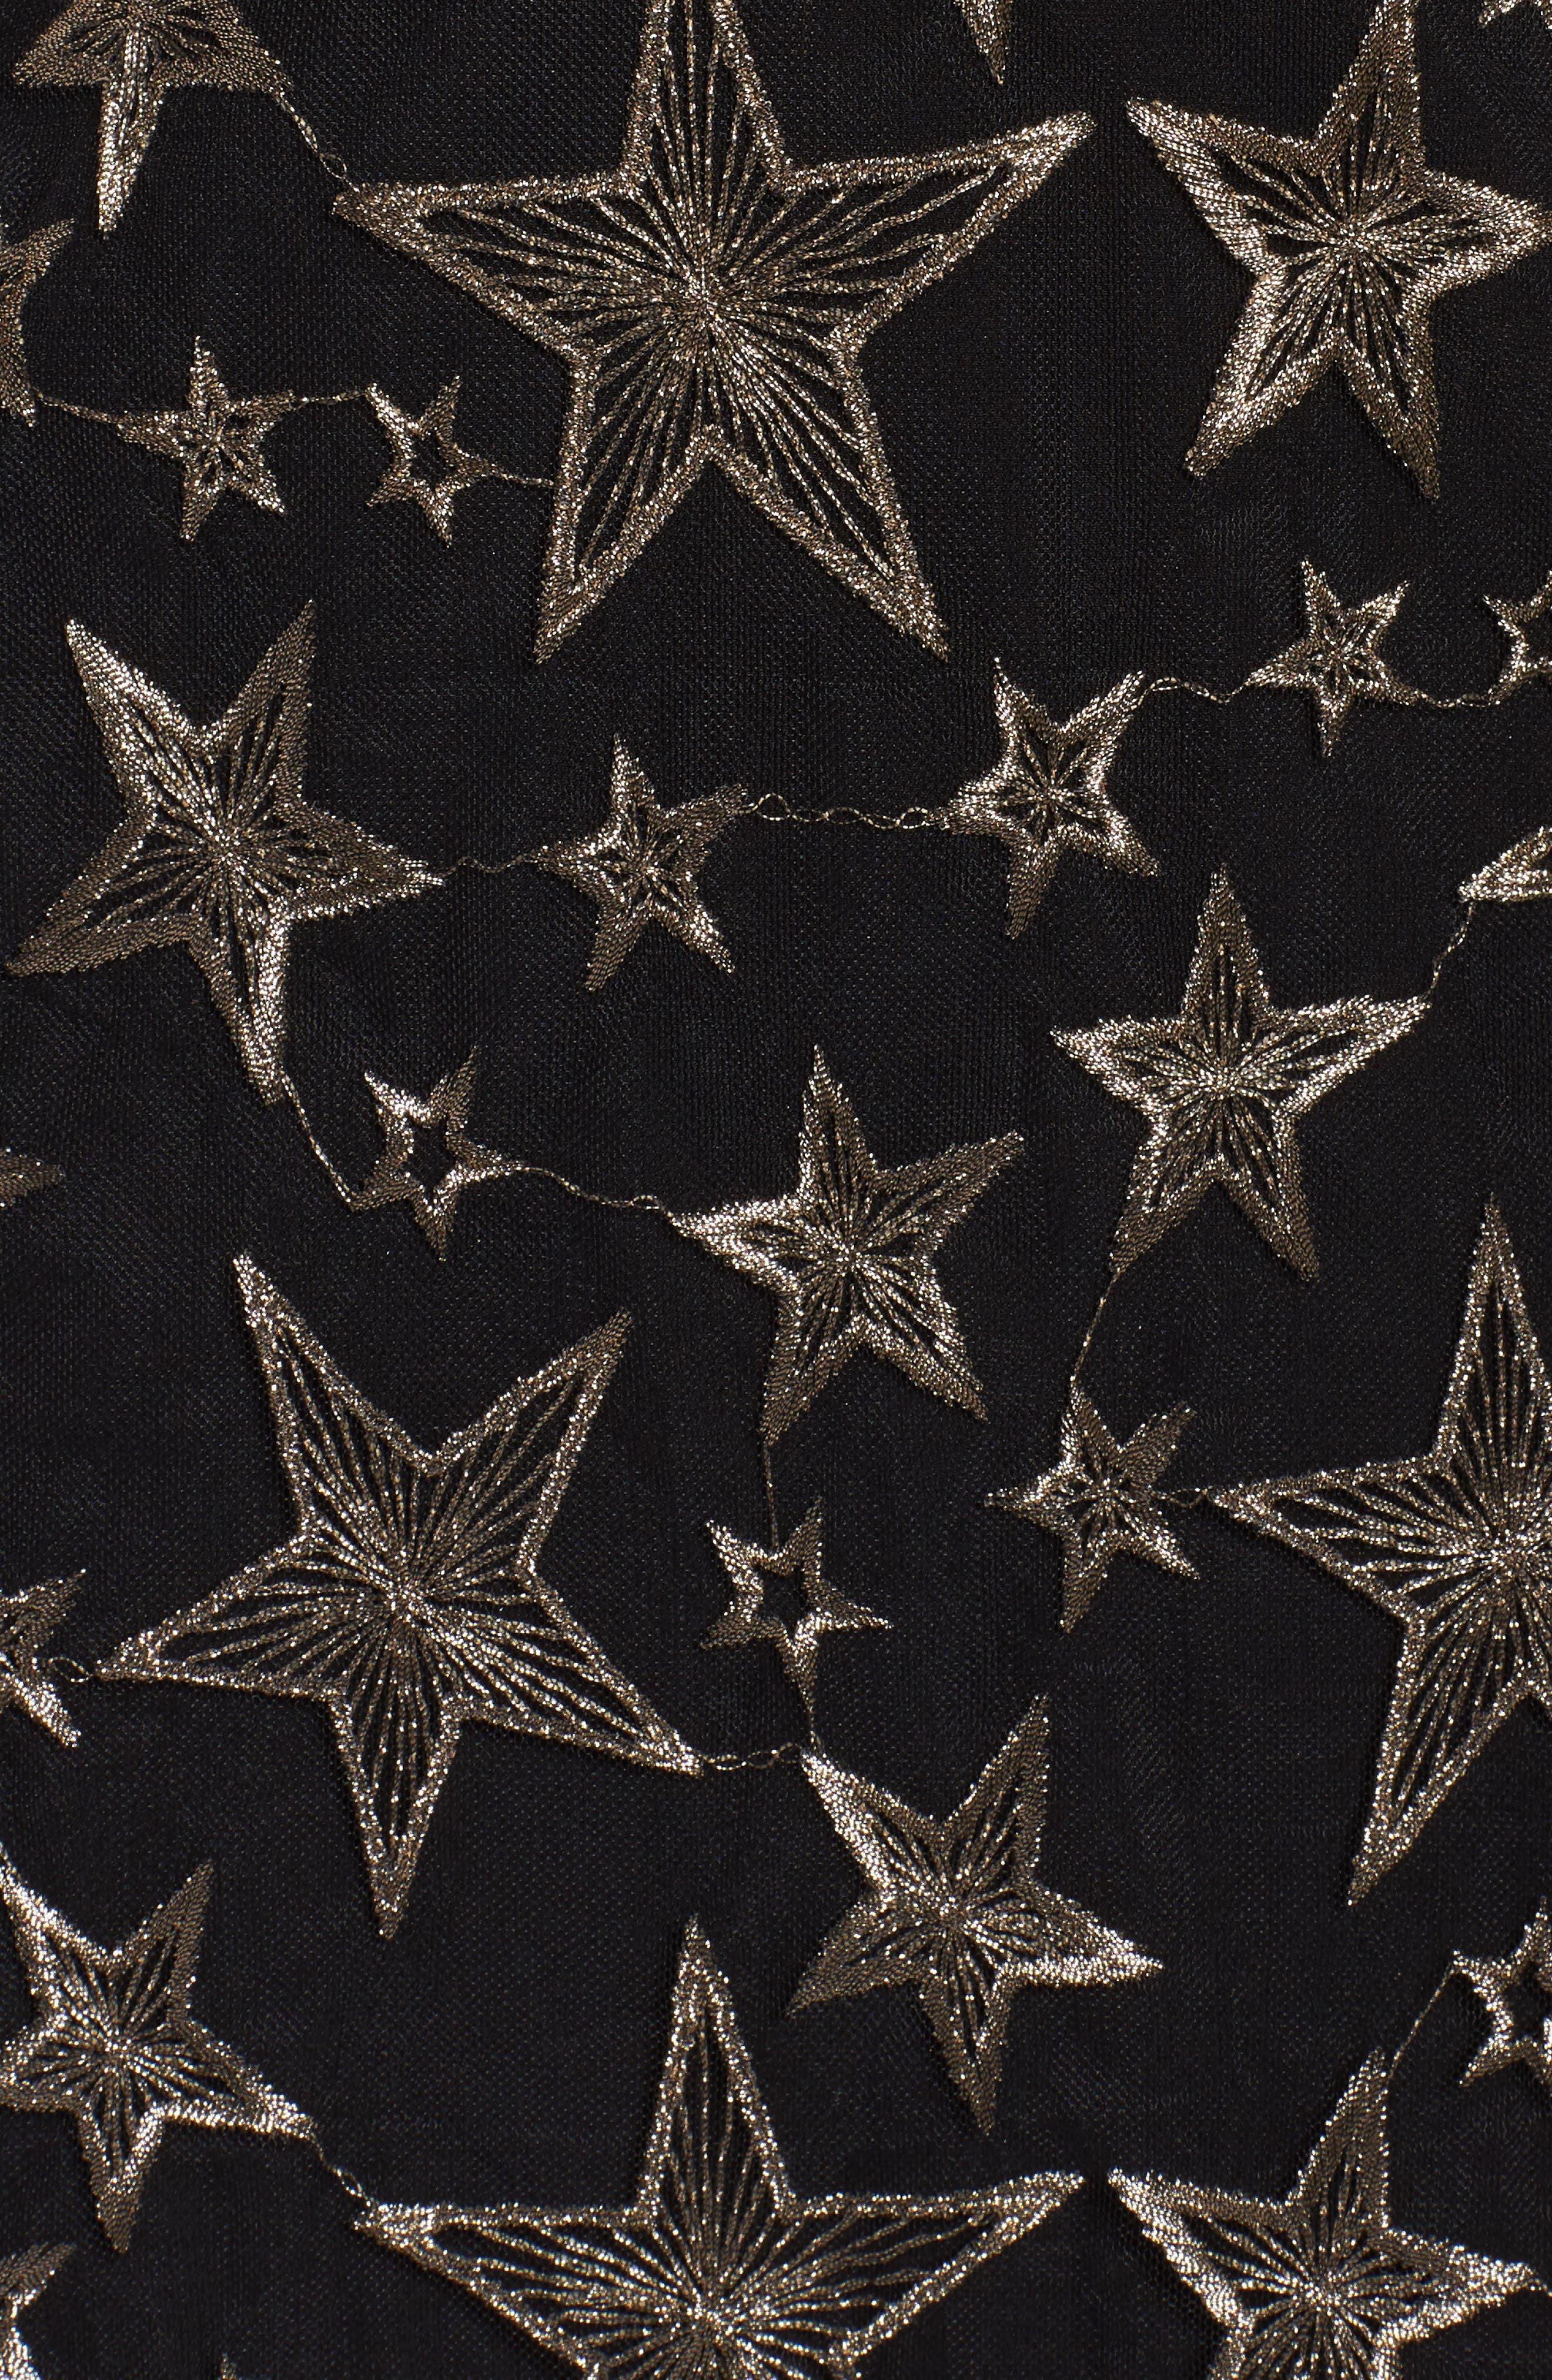 Off the Shoulder Star Embroidered Dress,                             Alternate thumbnail 5, color,                             001